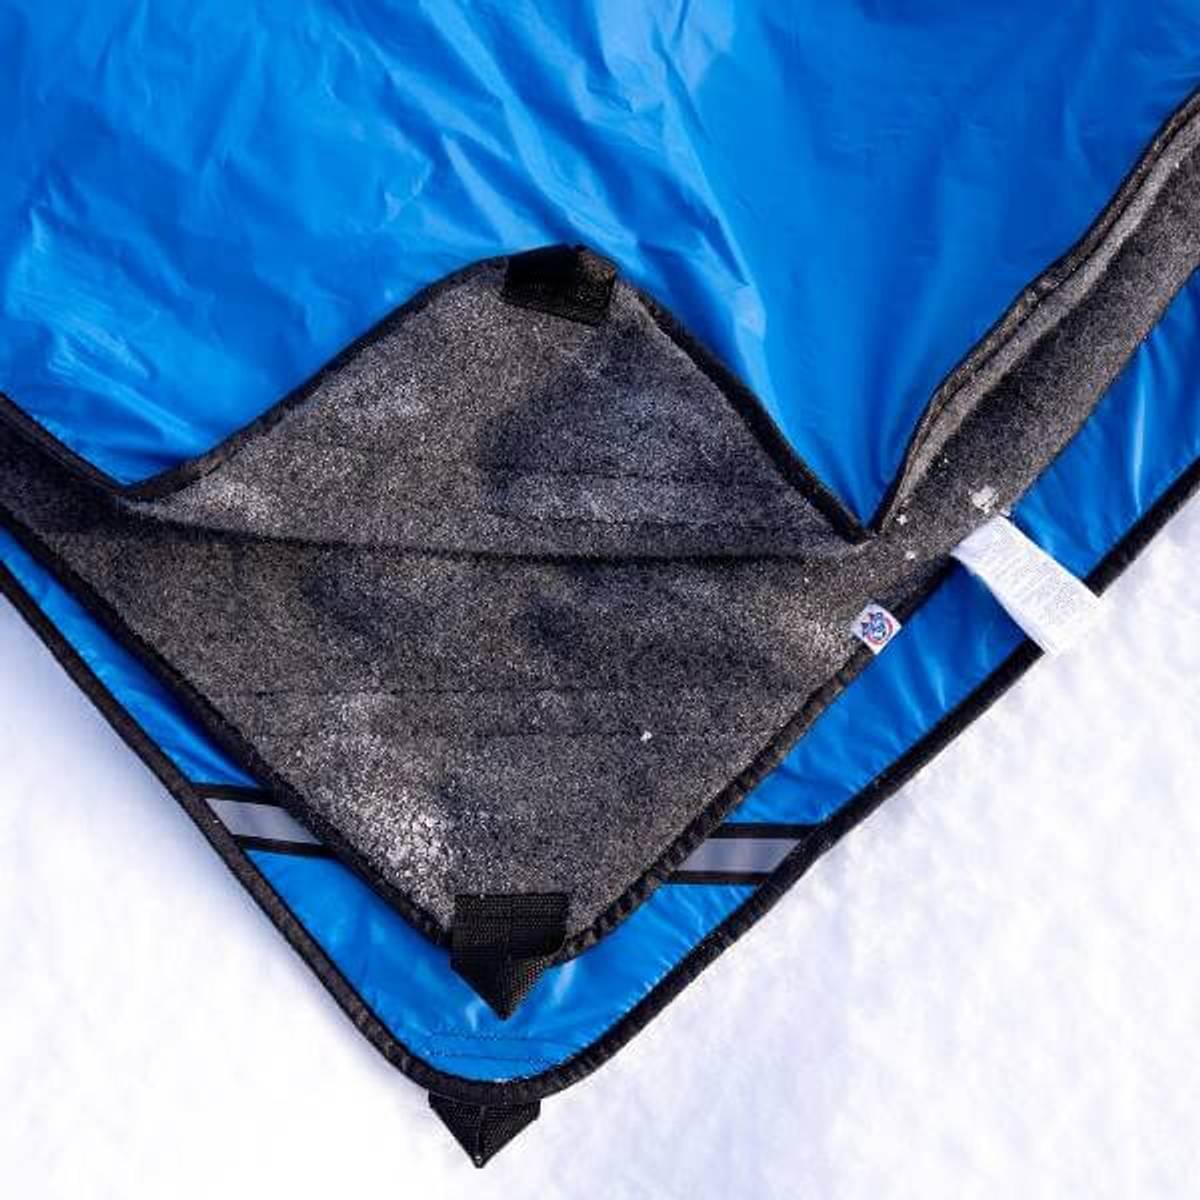 Varmeteppe hund med vindtett ytterstoff (sjekkpunkt-teppe)